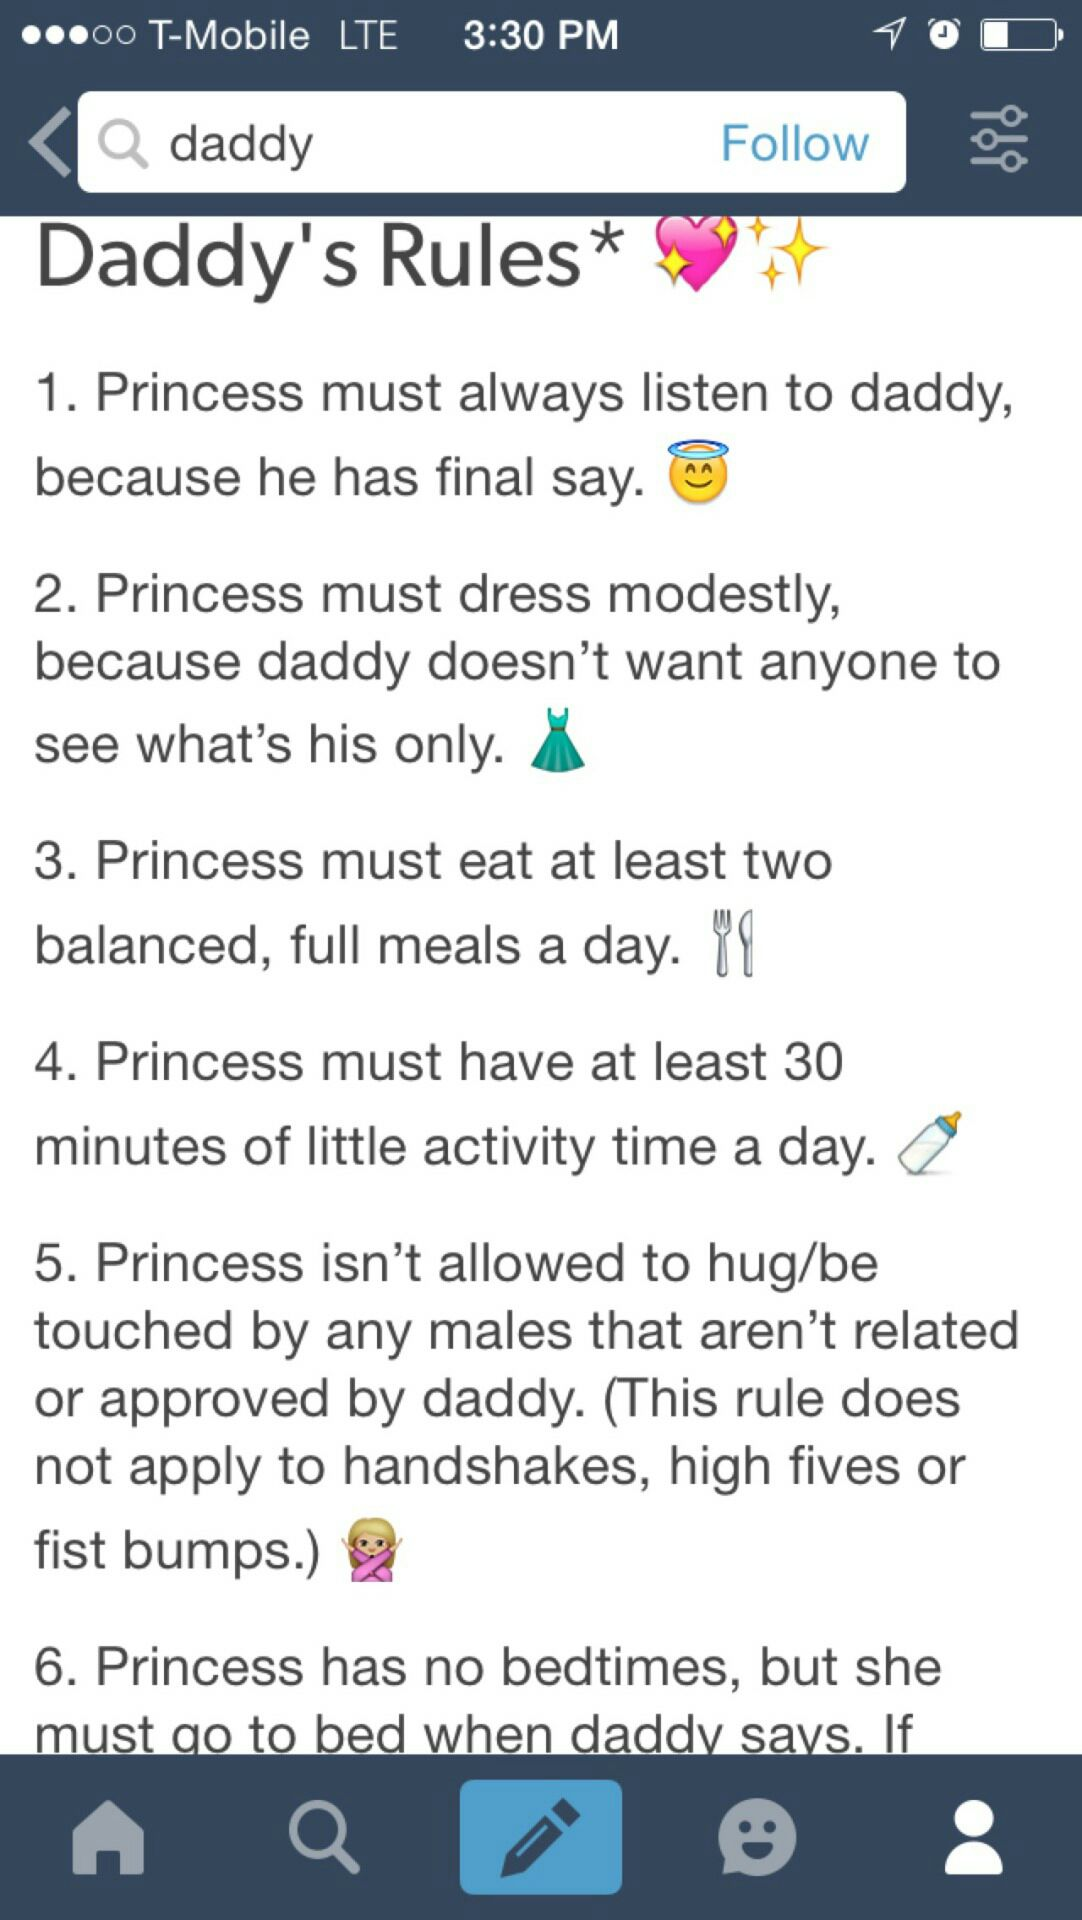 Regeln ddlg DADDY'S RULES